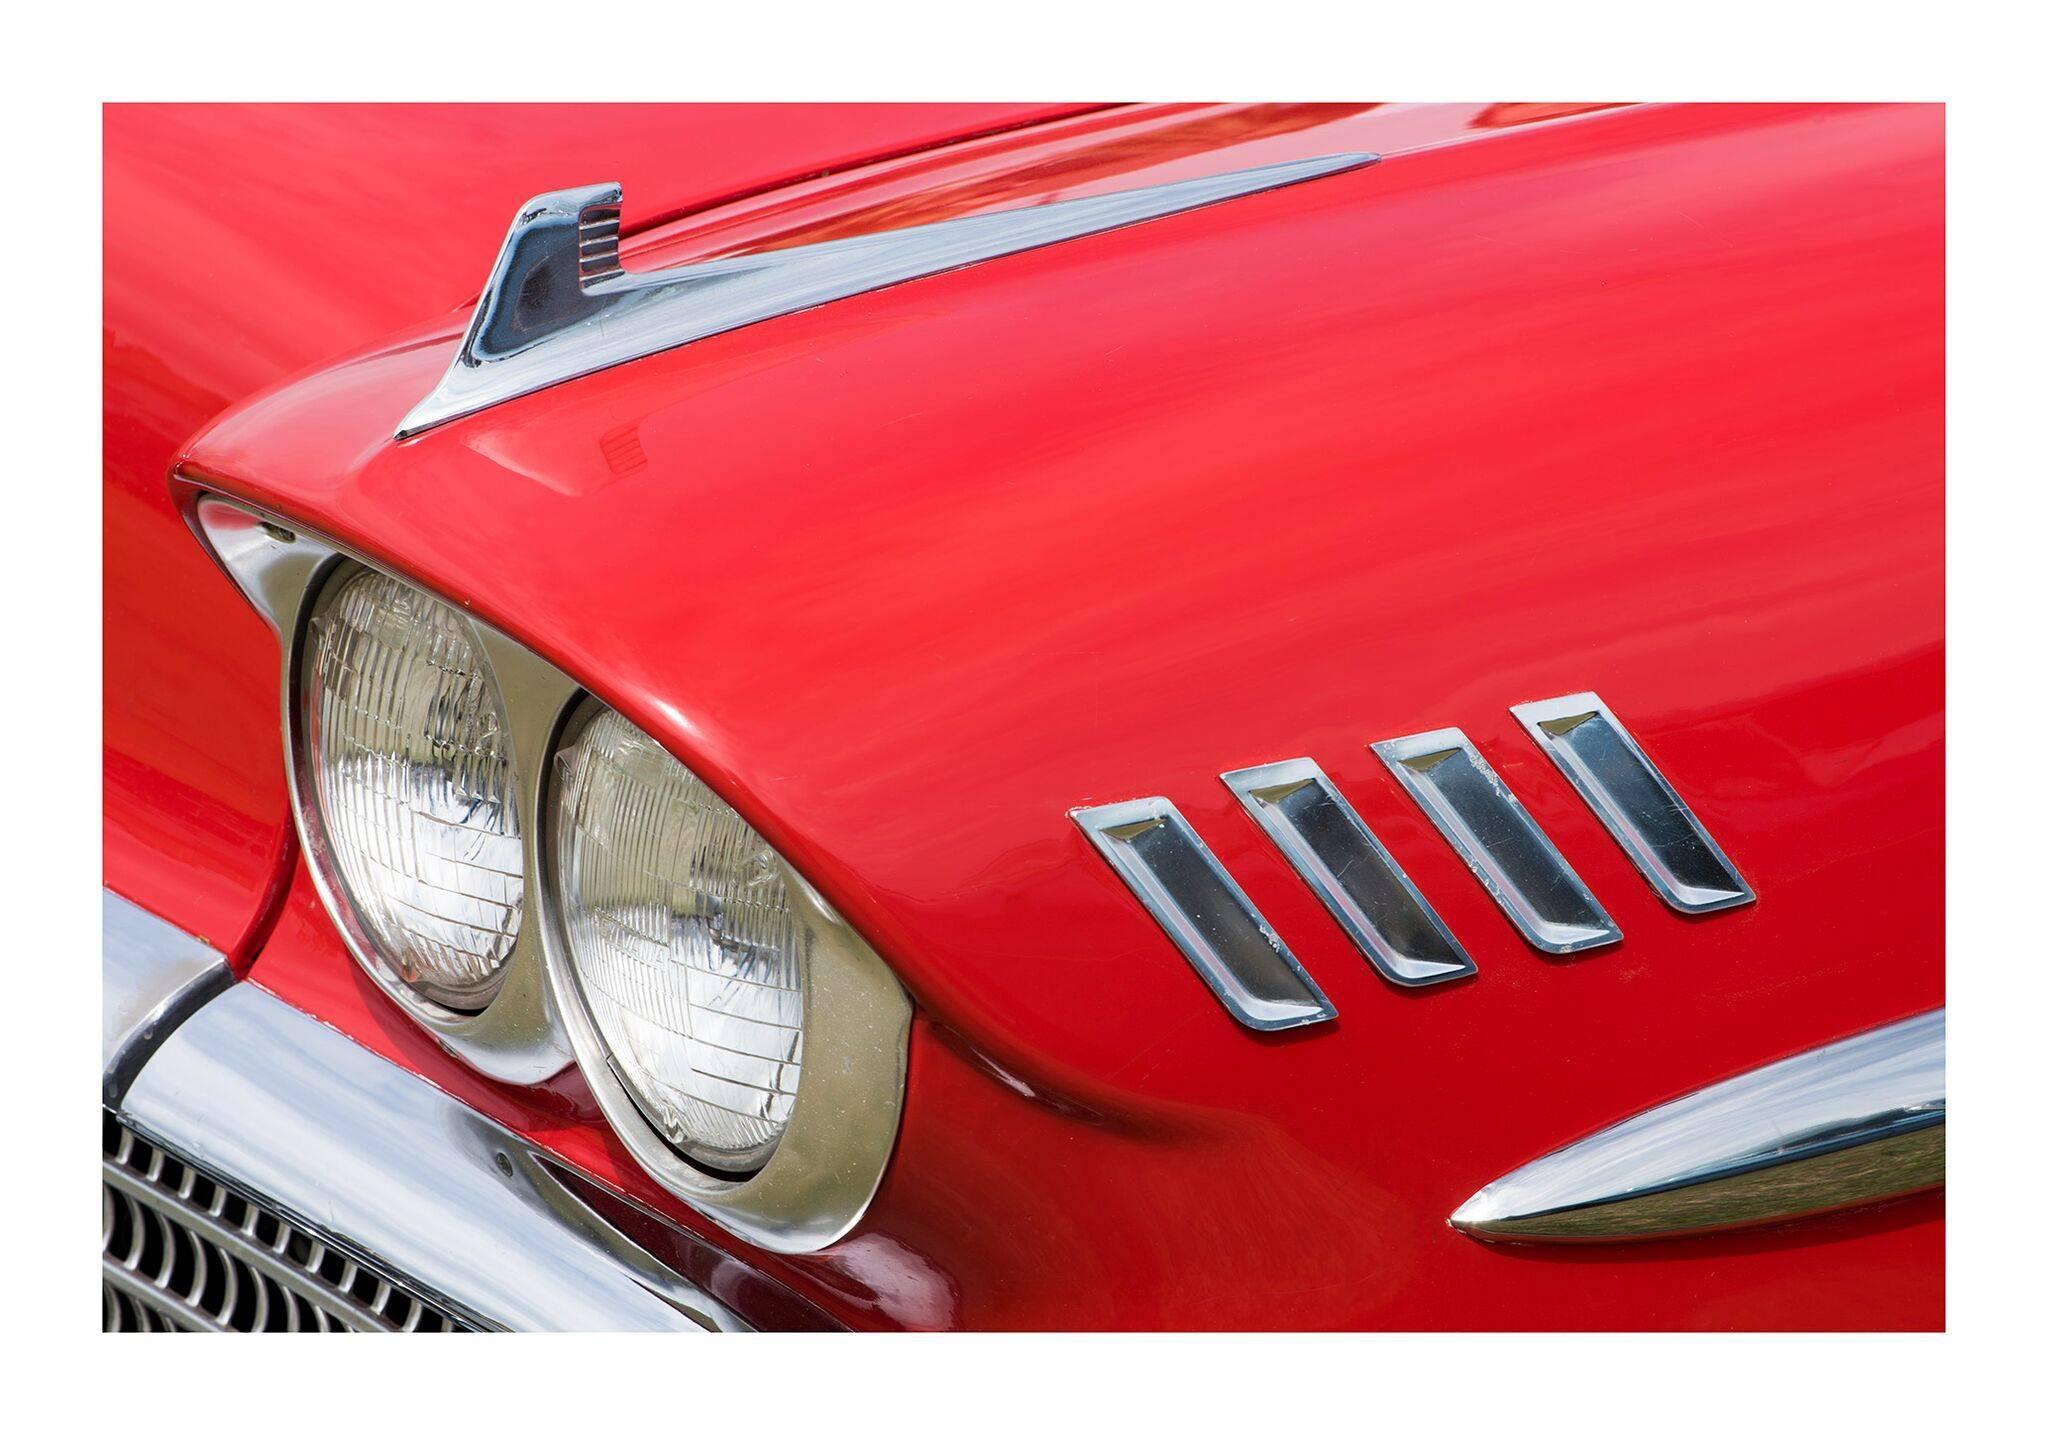 1958 Chevrolet Impala, 2015 - contemporary red car lambda print